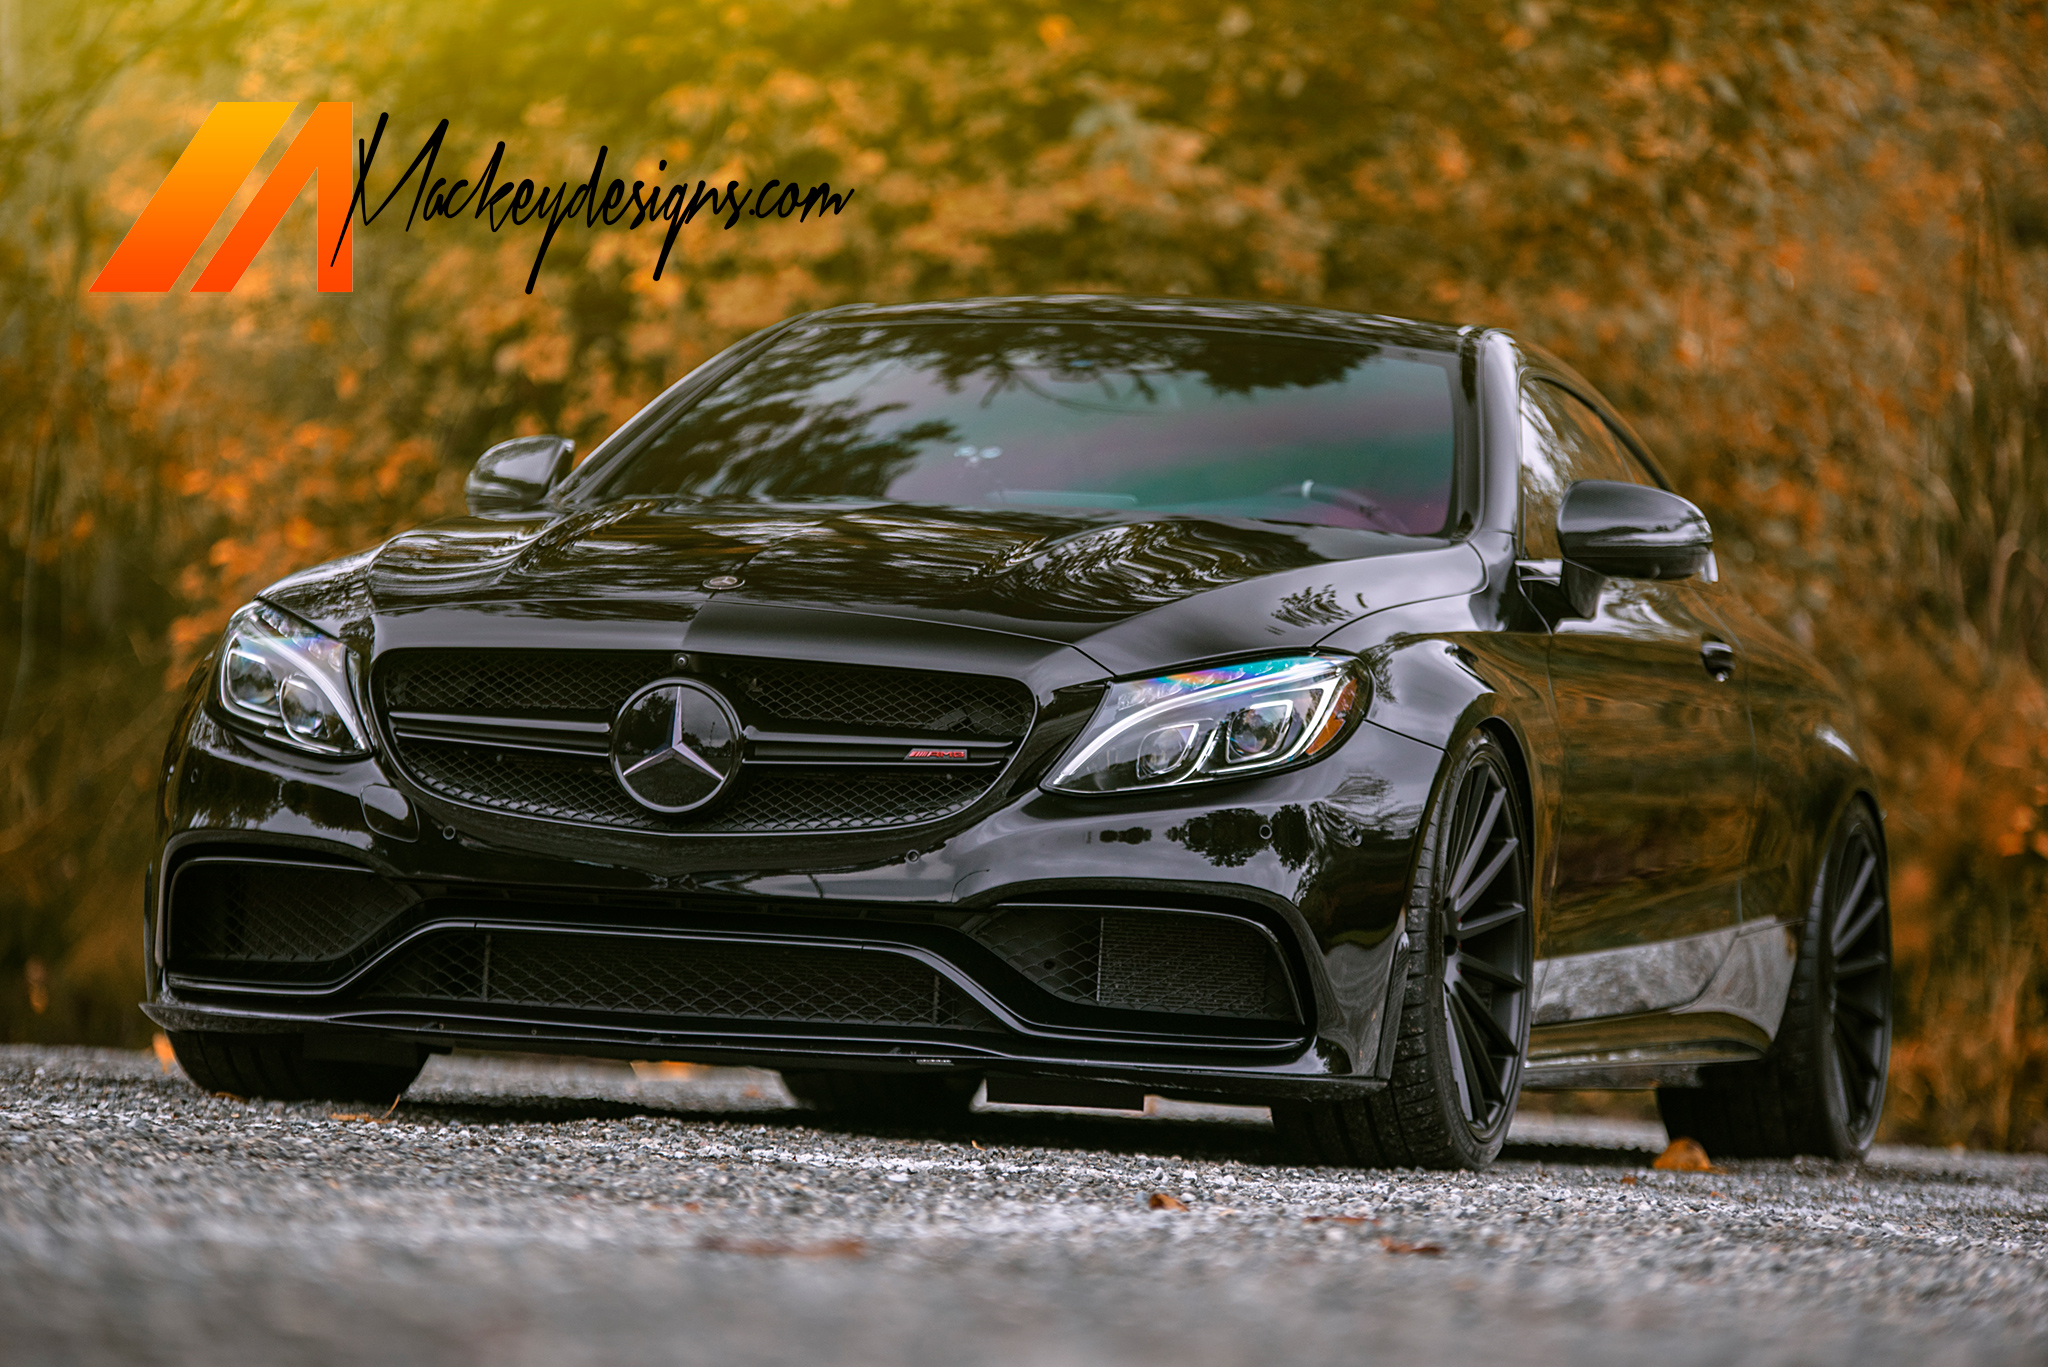 Mackeydesigns_Mercedes_C63S-17.jpg